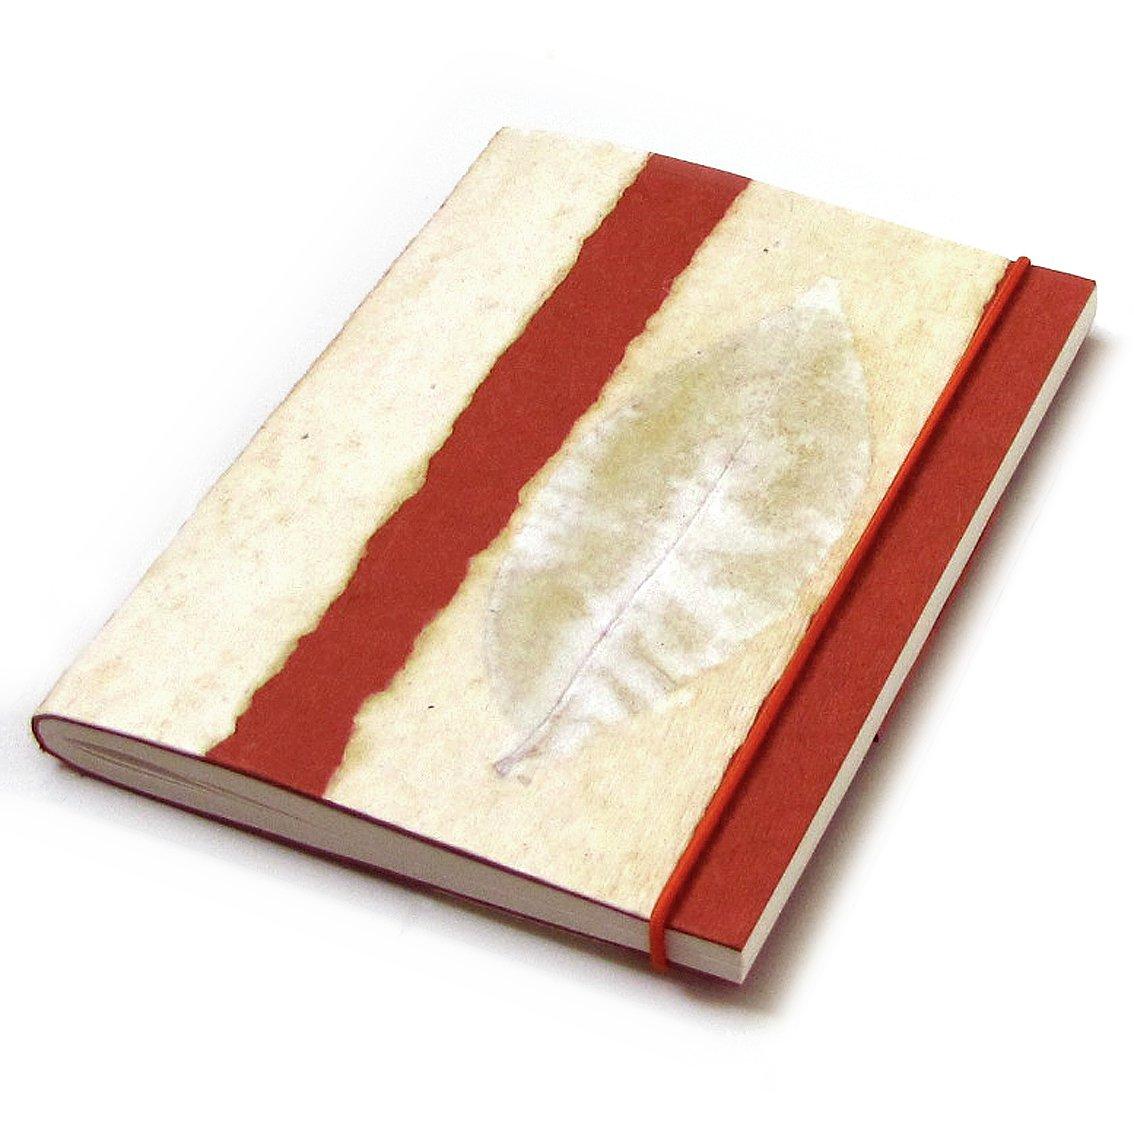 Journal sketching handmade striped natural leaf paper mom present elastic orange 5x7 88pp